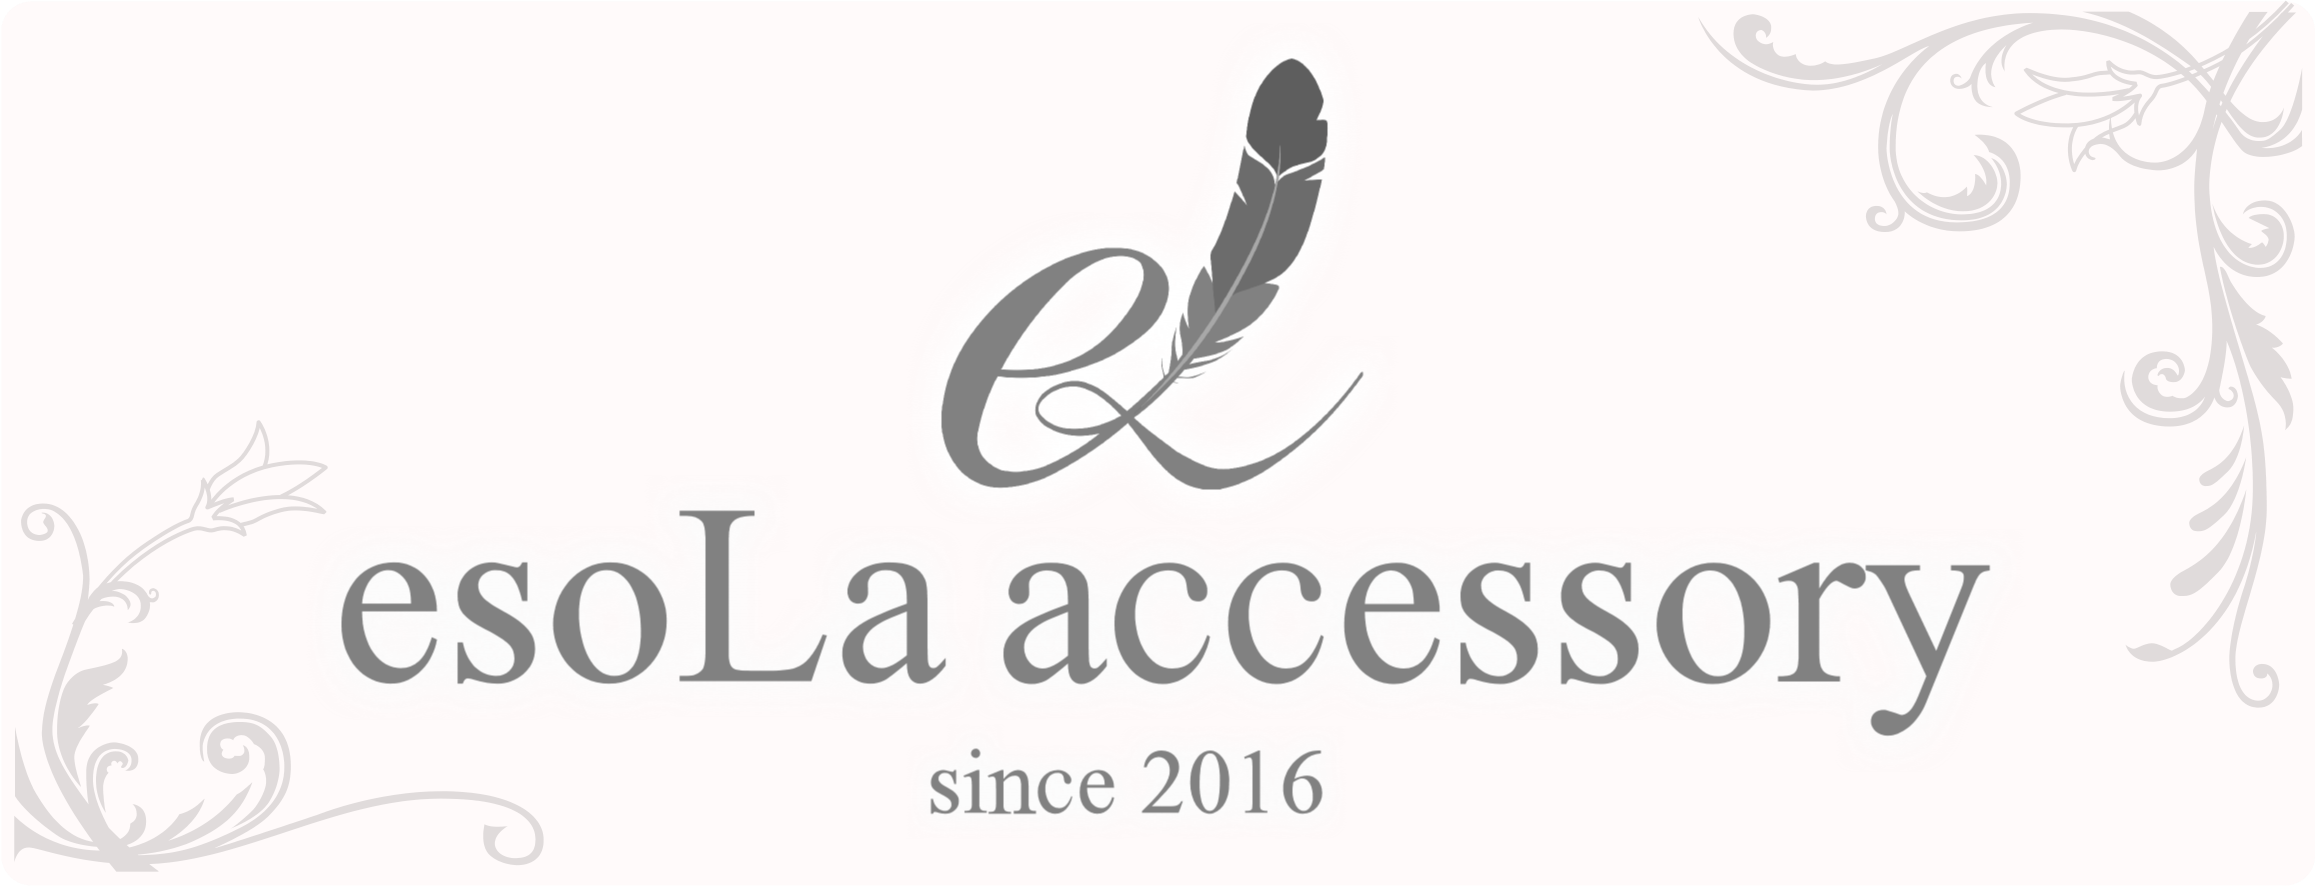 esoLa accessory